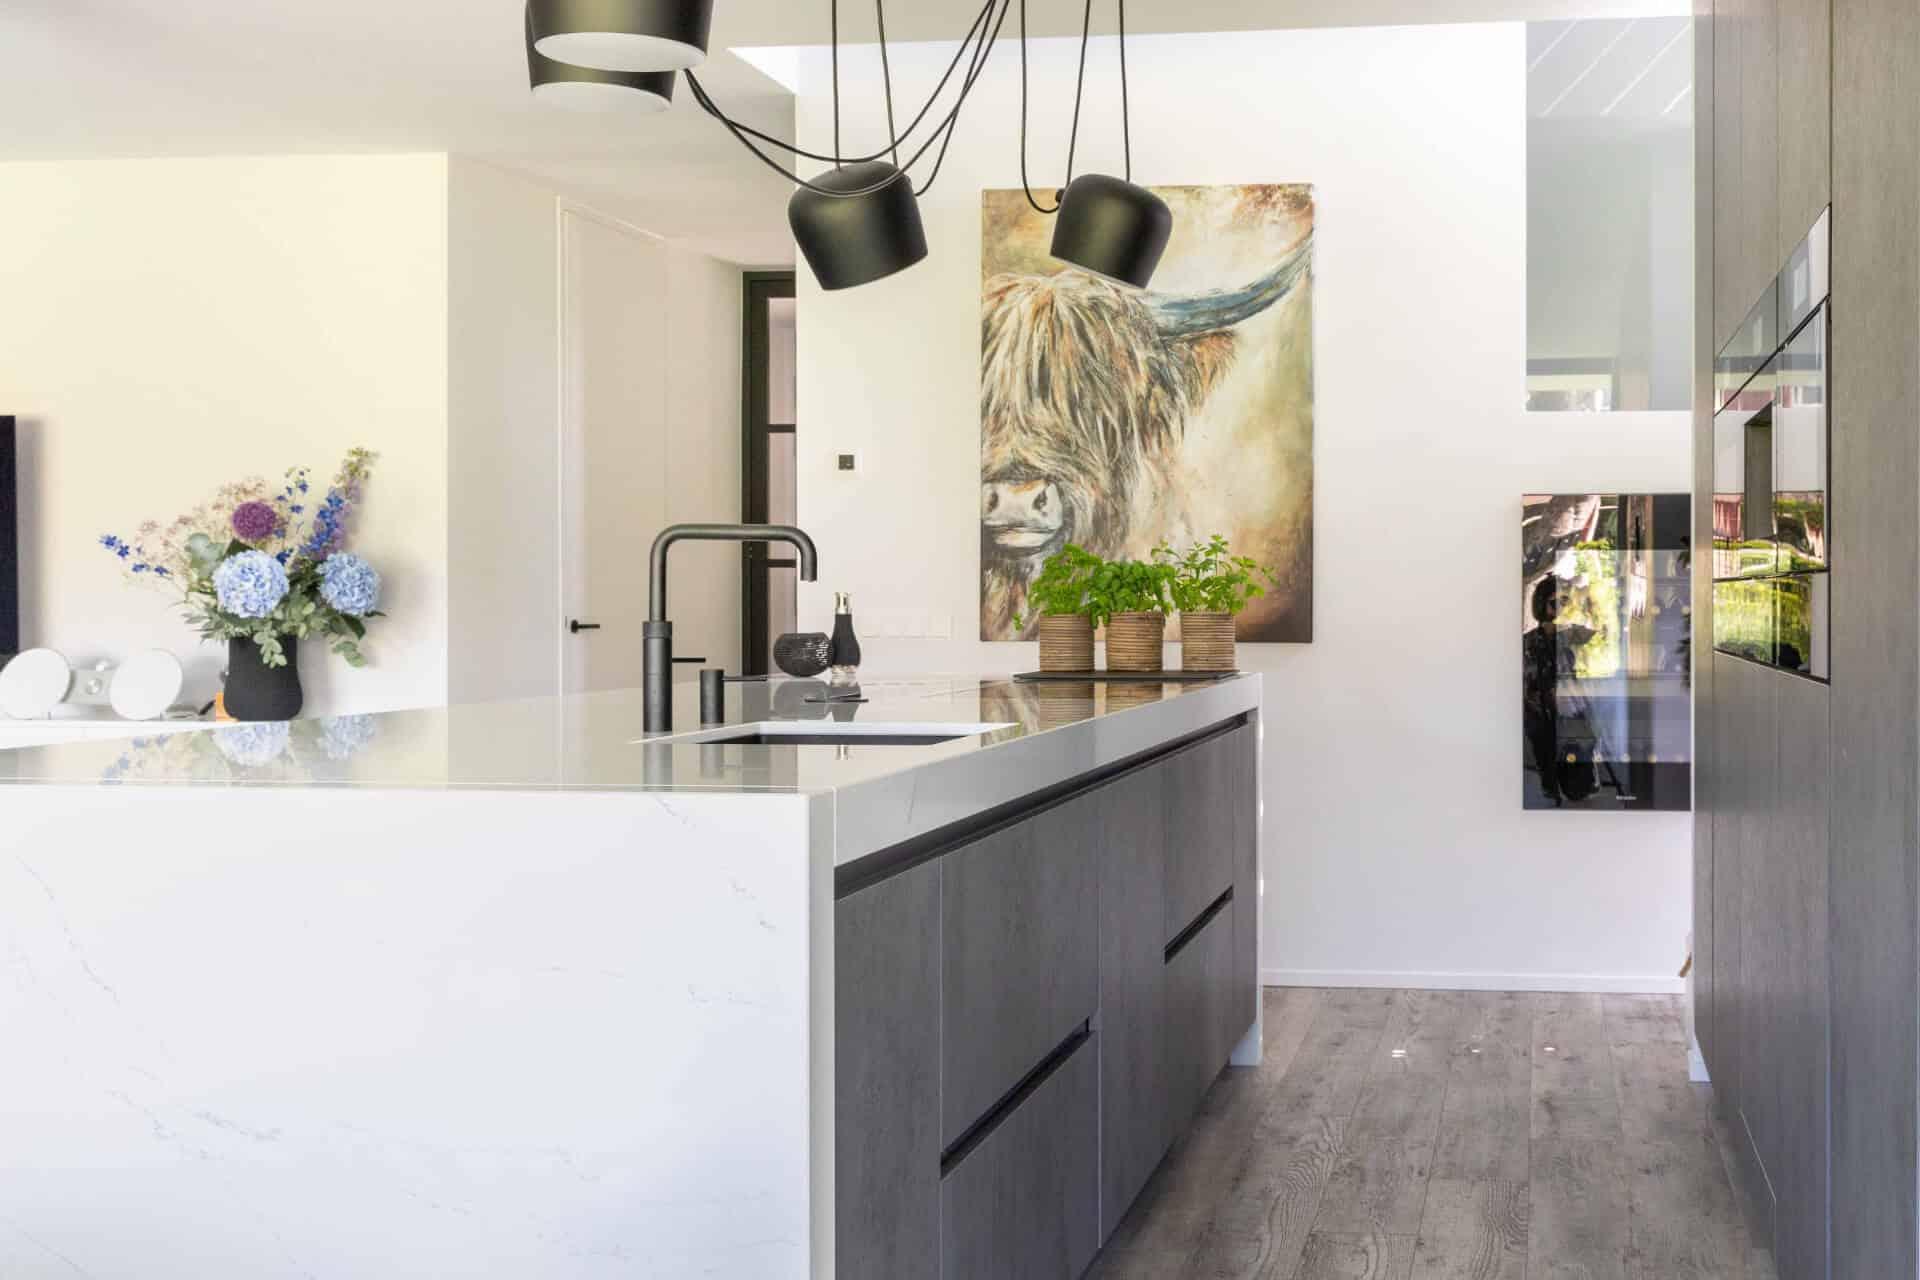 Luxe Design Keuken Lochem Van Ginkel Keukens Barneveld 024